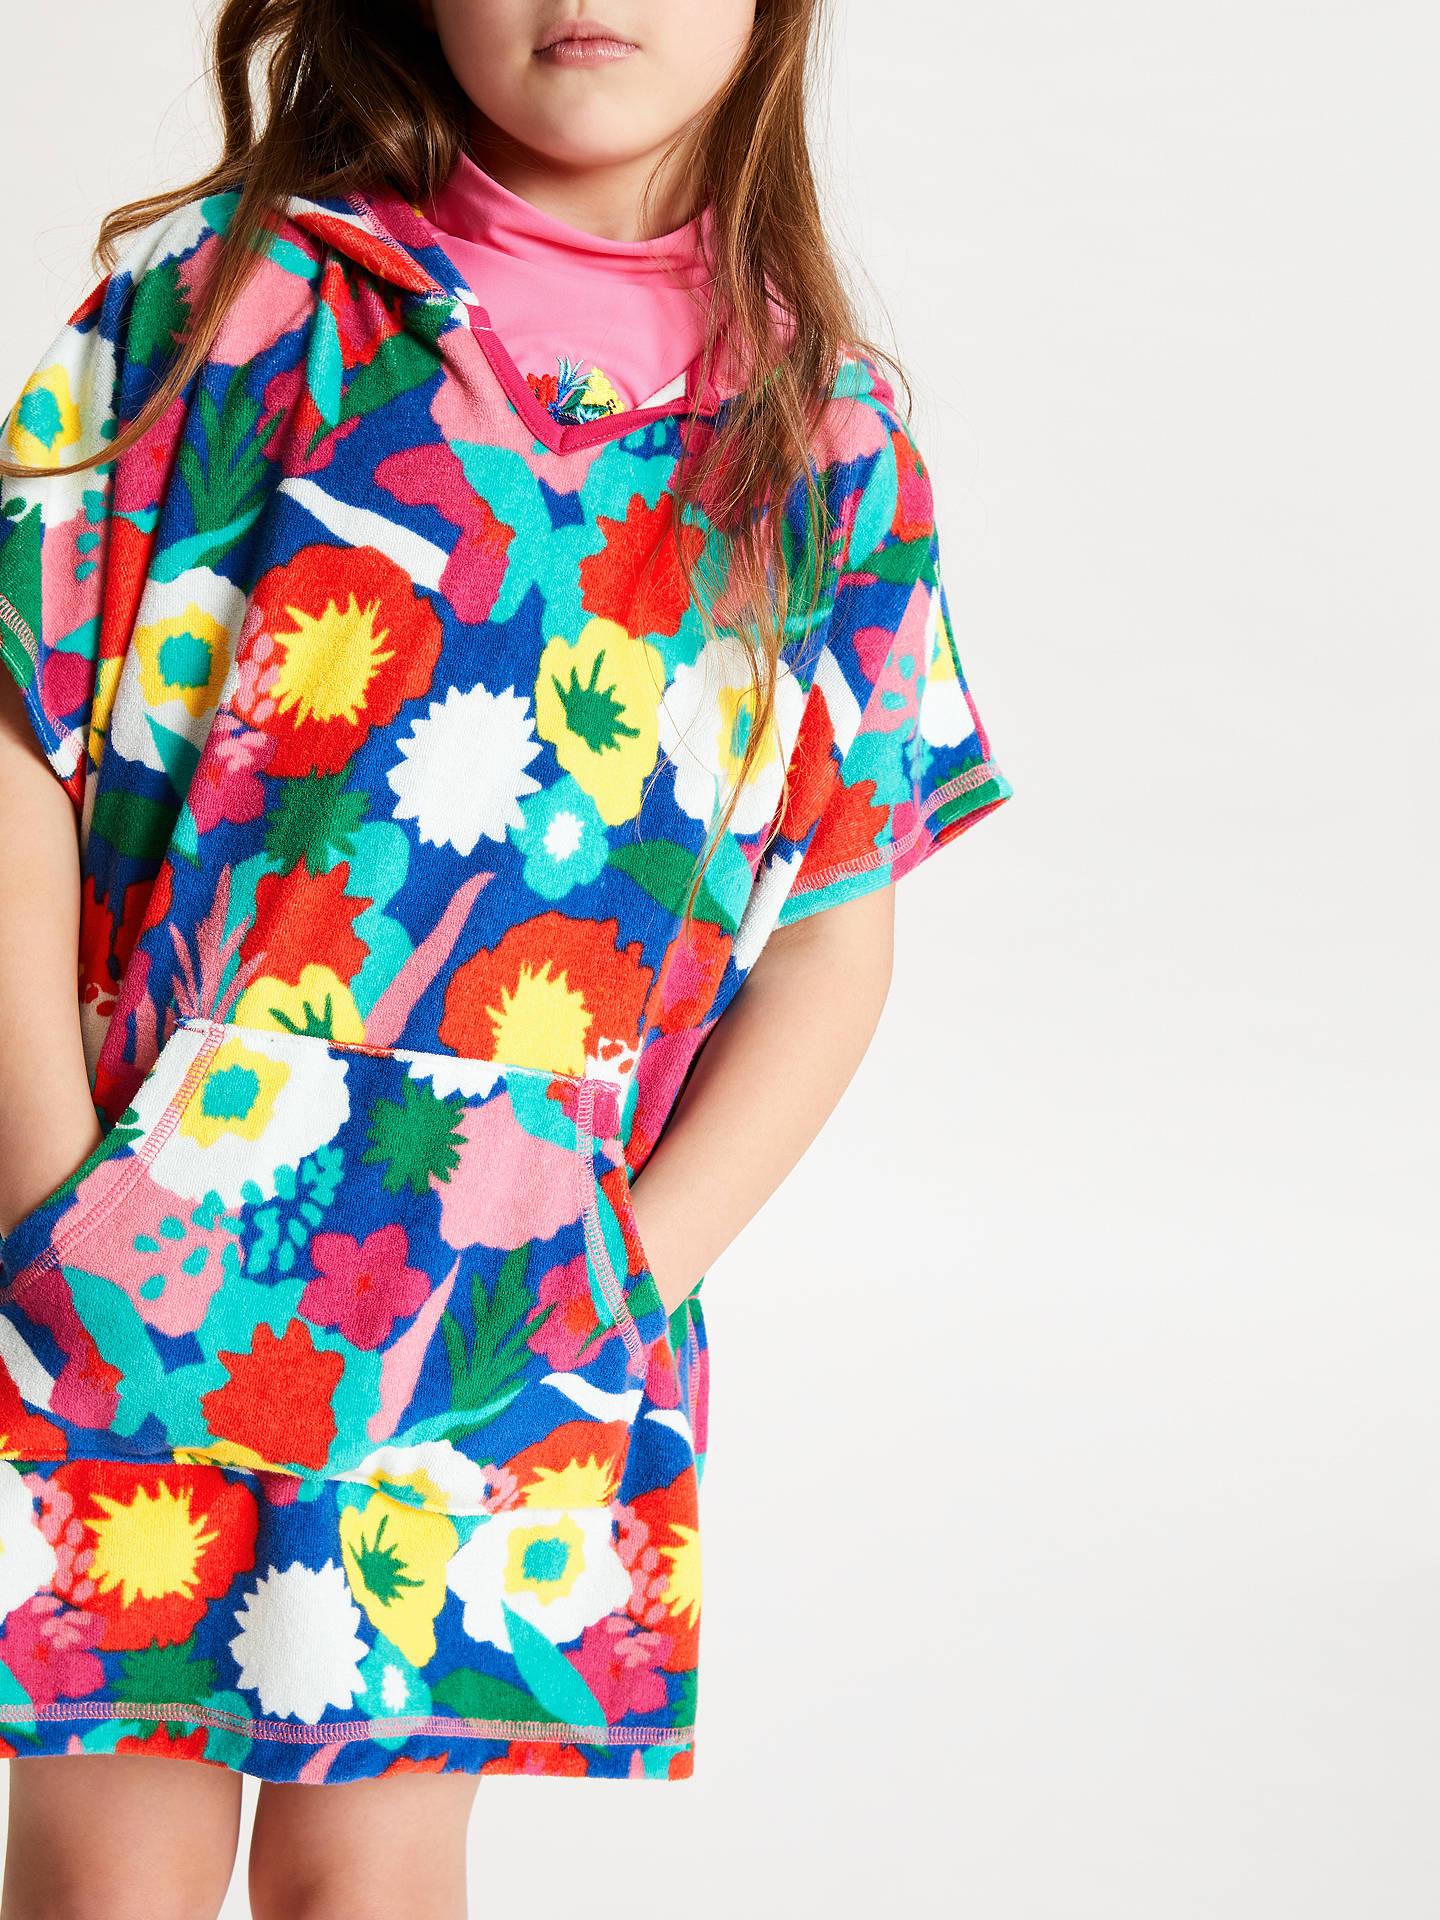 94c861cbd ... Buy John Lewis & Partners Girls' Floral Towel Poncho, Multi, S Online  at ...